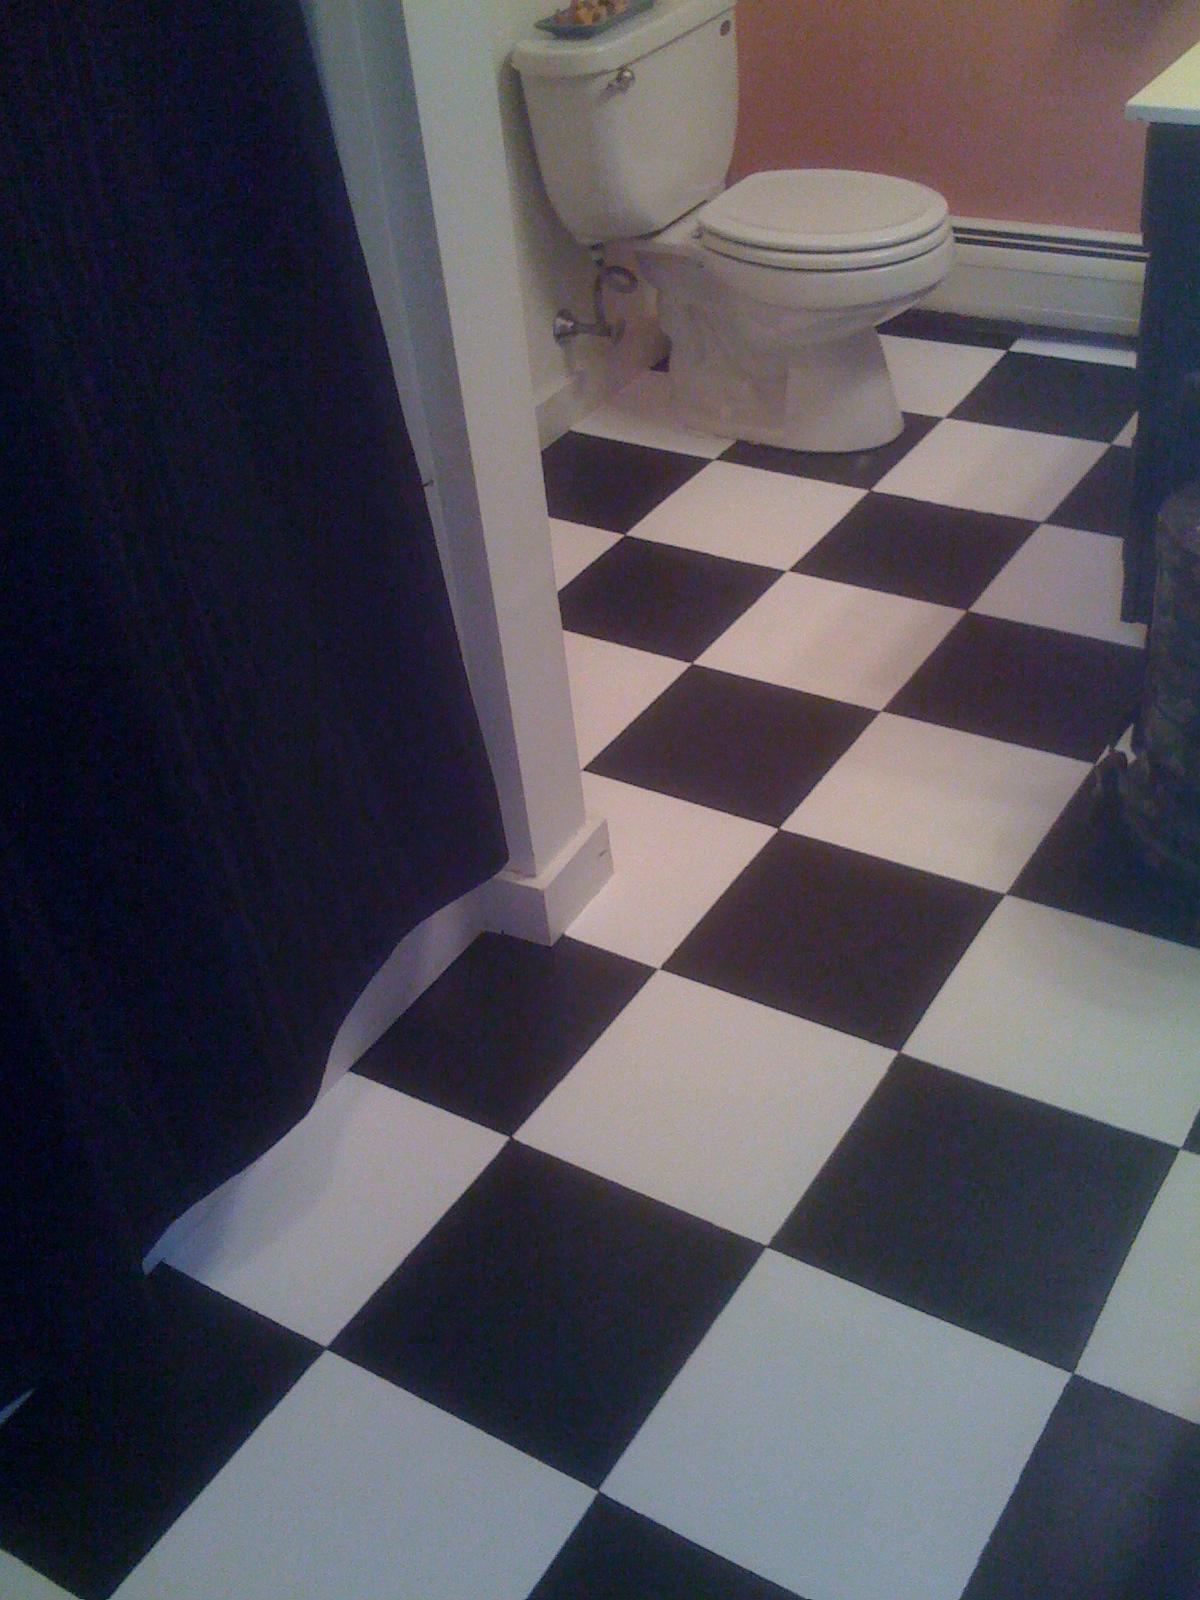 How do i remove vinyl tile flooring answer start by deciding how how do i remove vinyl tile flooring answer start by deciding how much time dailygadgetfo Gallery